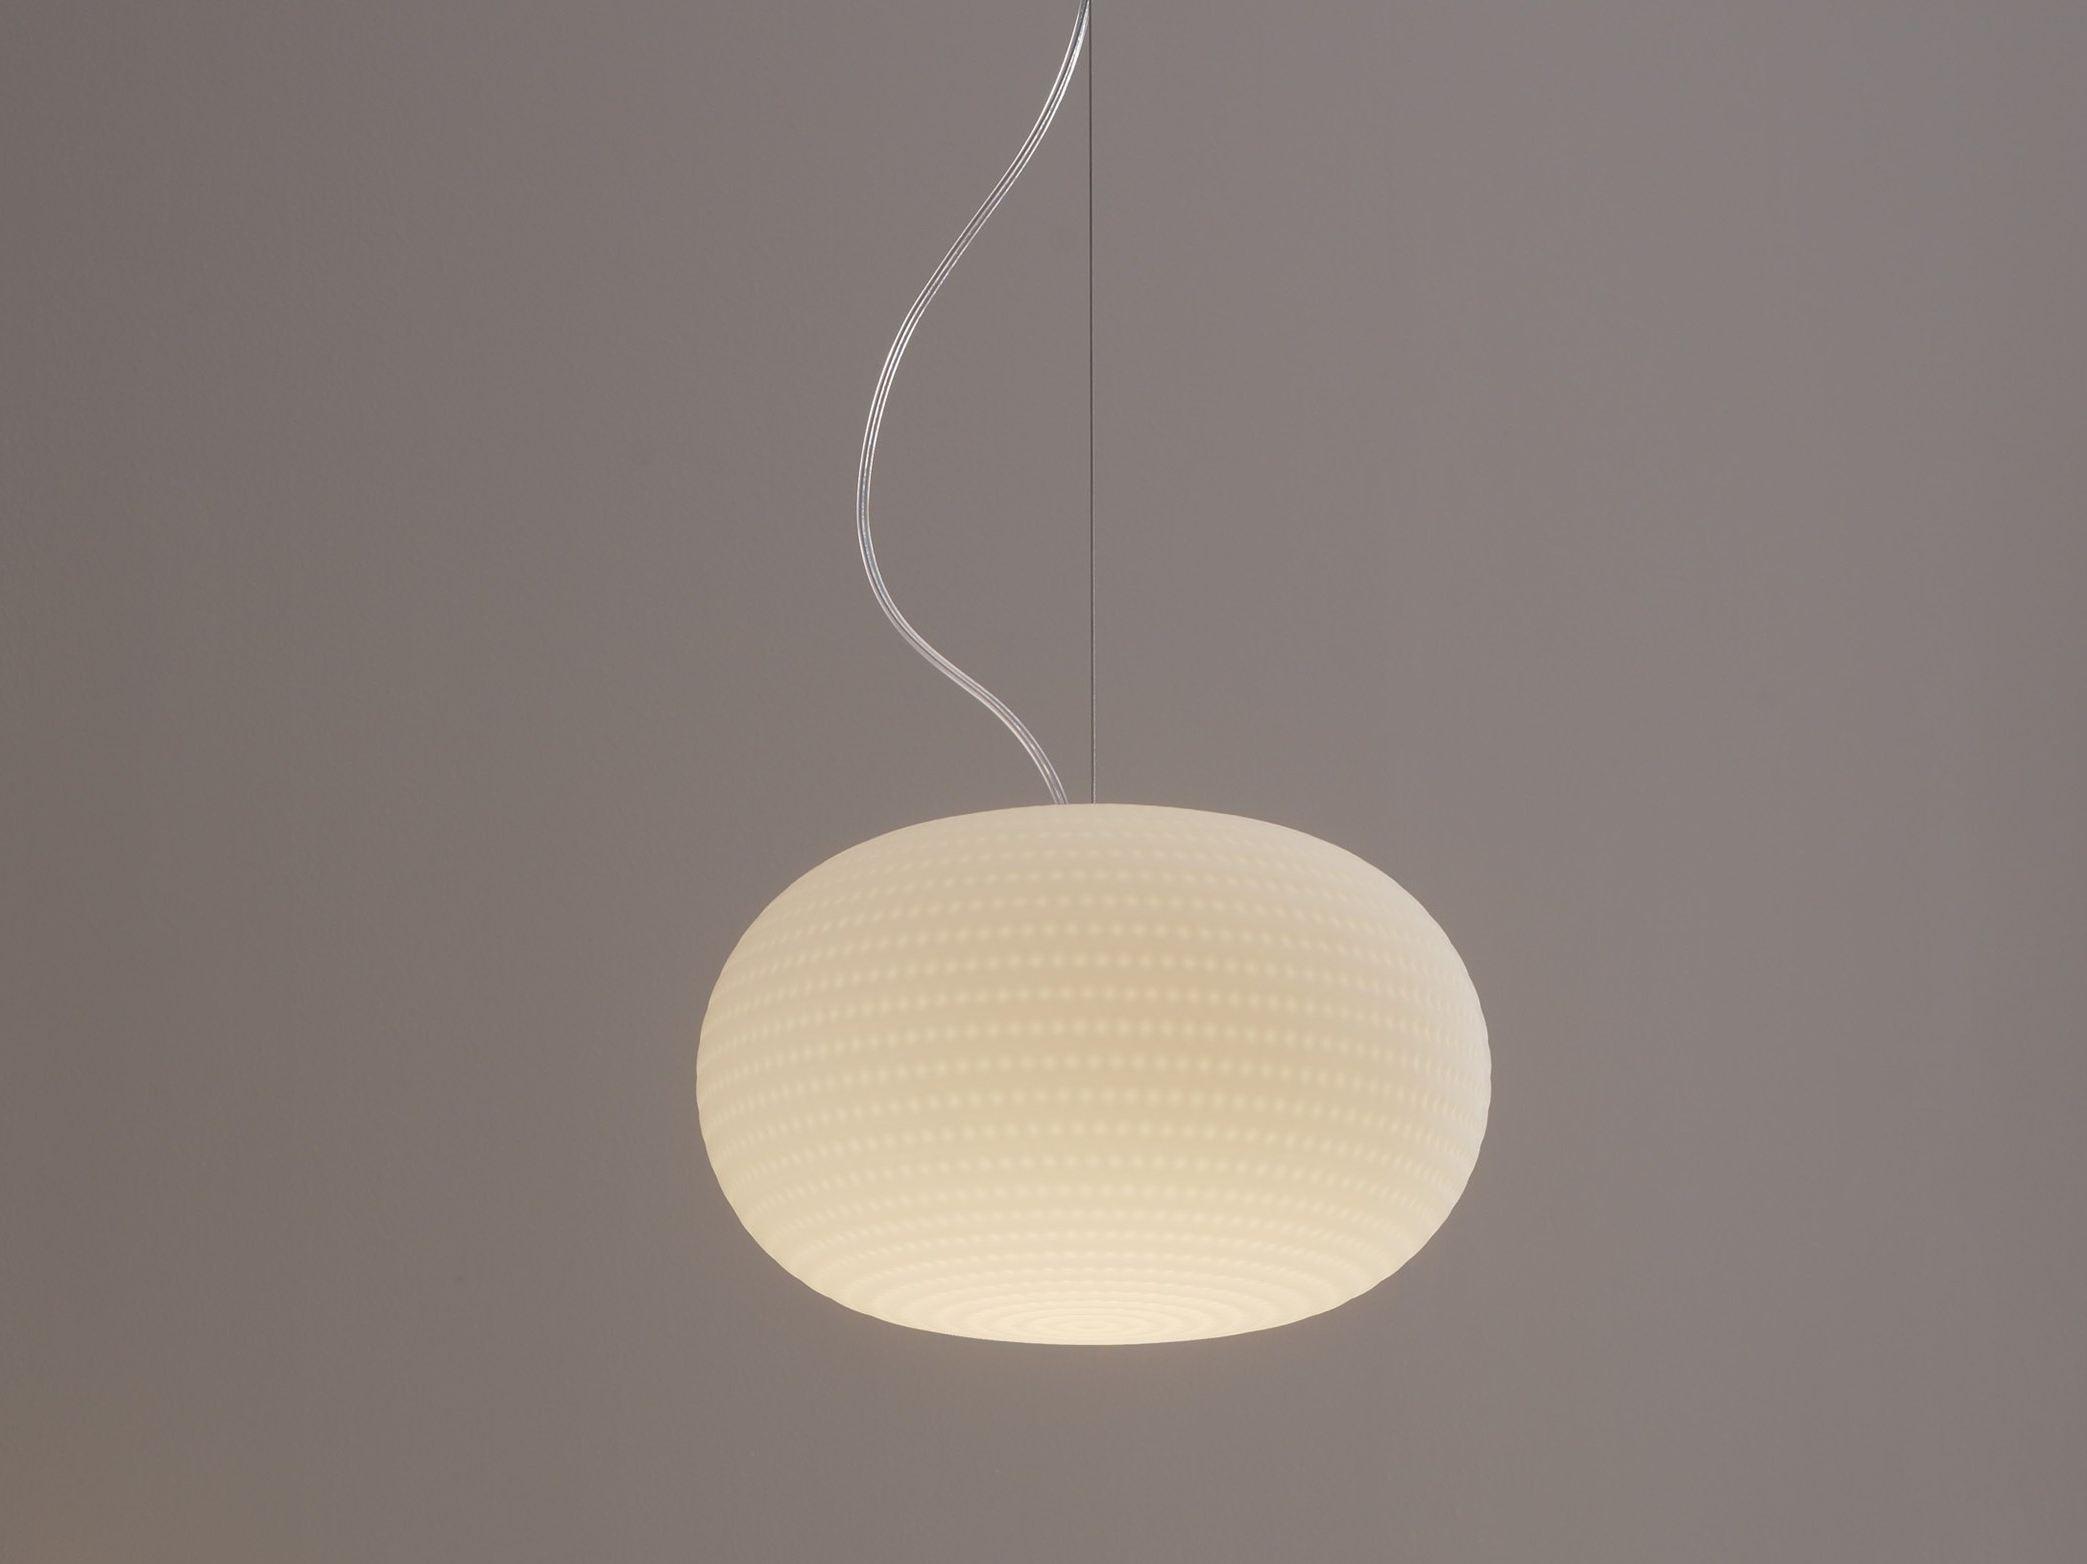 LAMP SOSP BIANCA SMALL LED 4,5W 230V BI RAL9002 NO ROSE